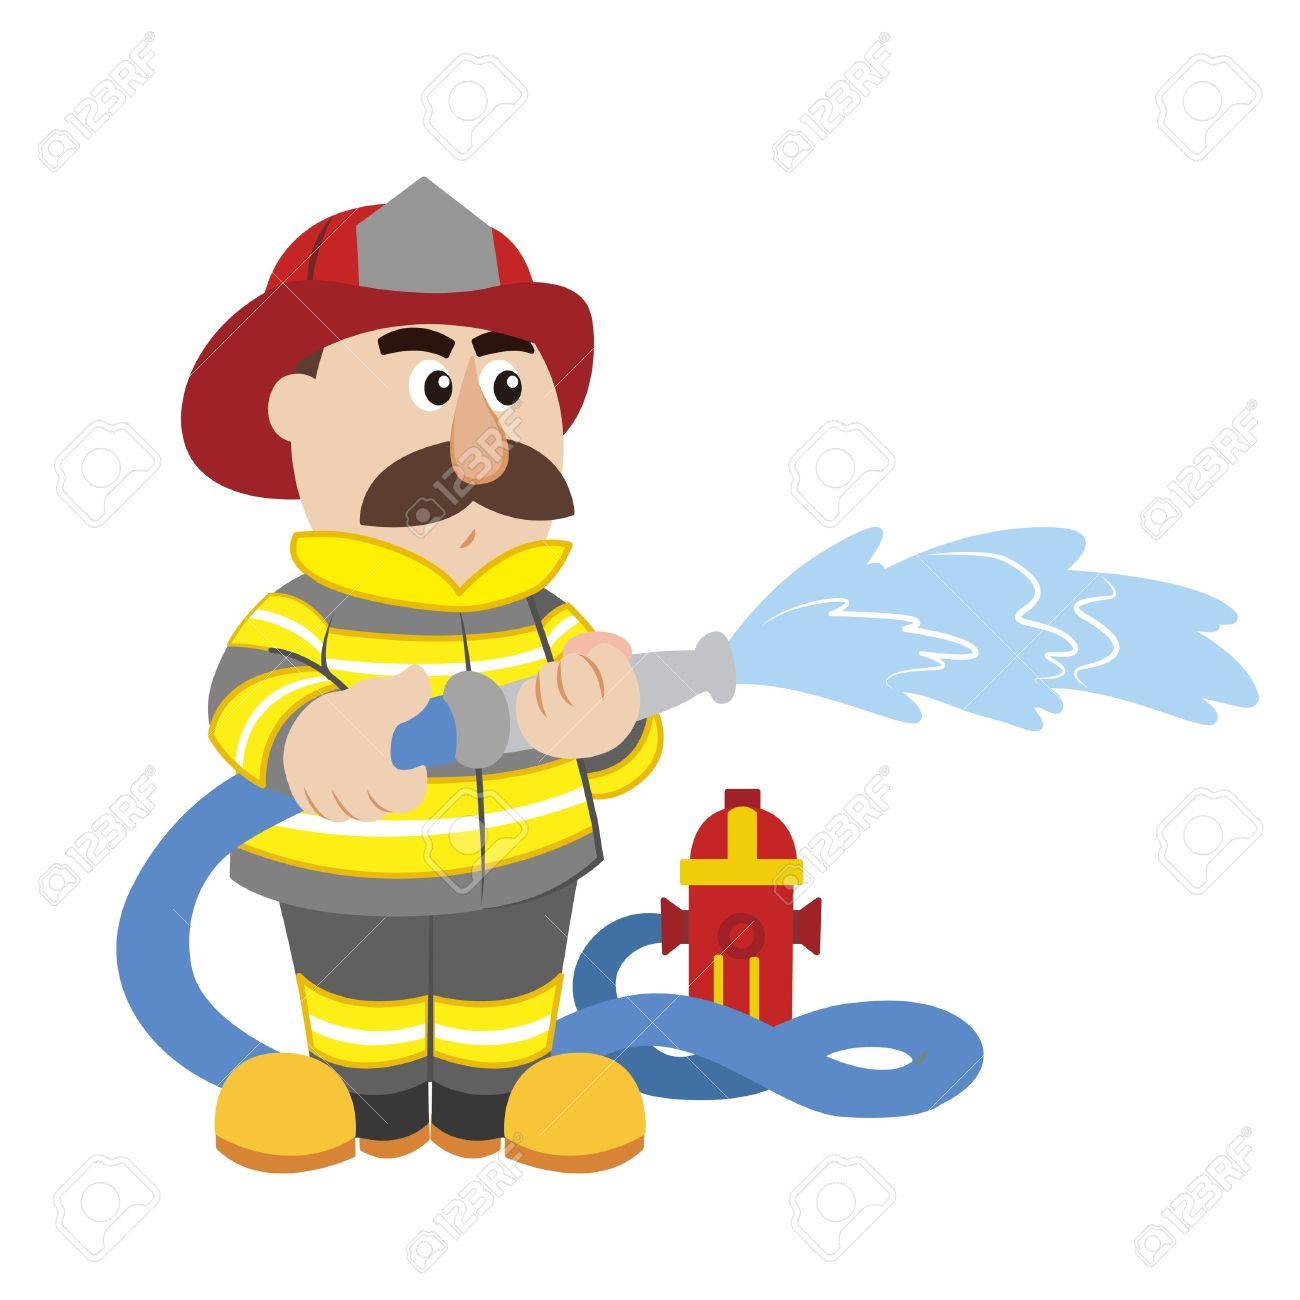 Free Fireman Clipart